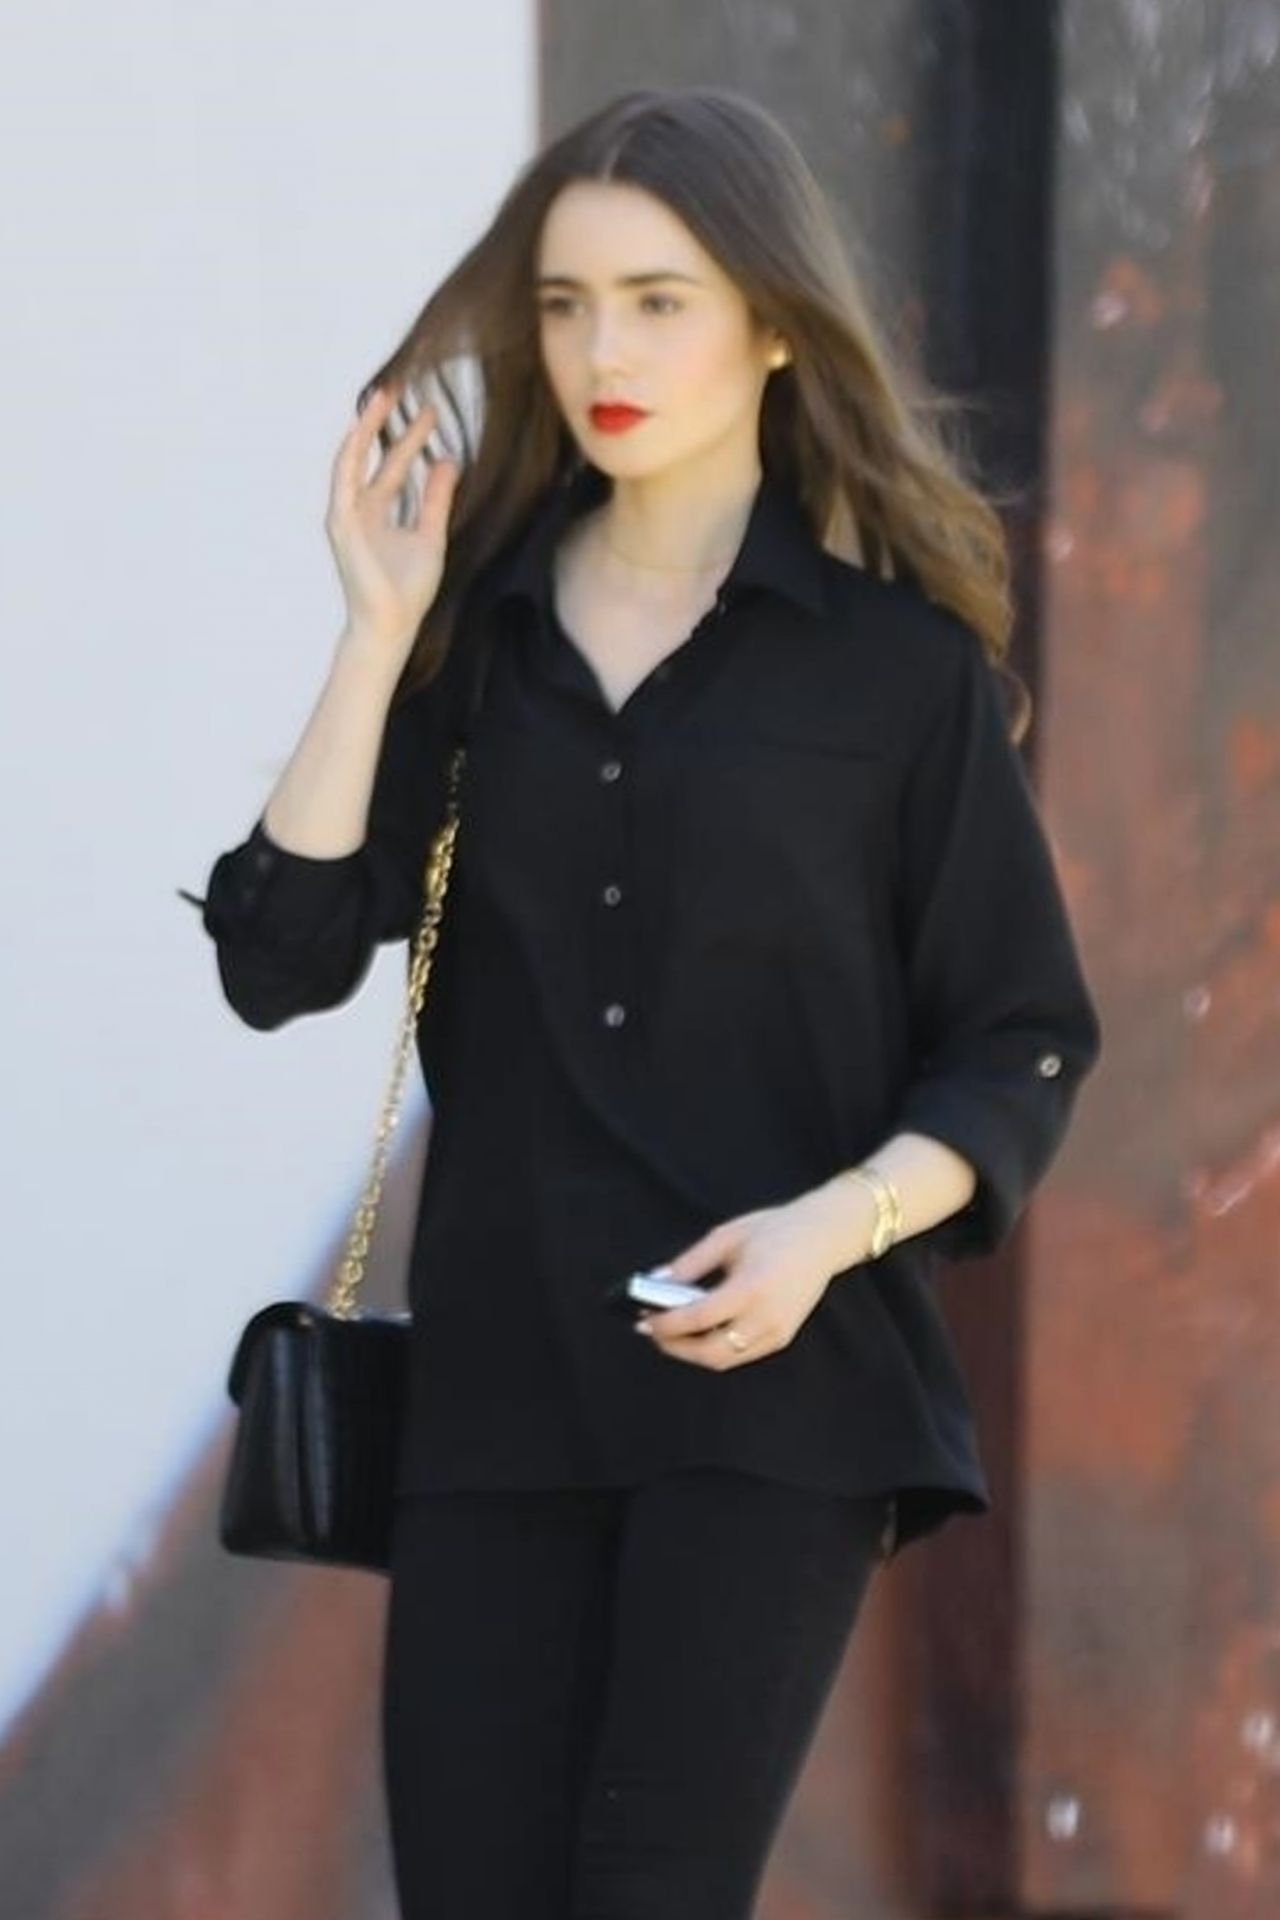 12bbda300e21 Lily collins hollywood celebrity